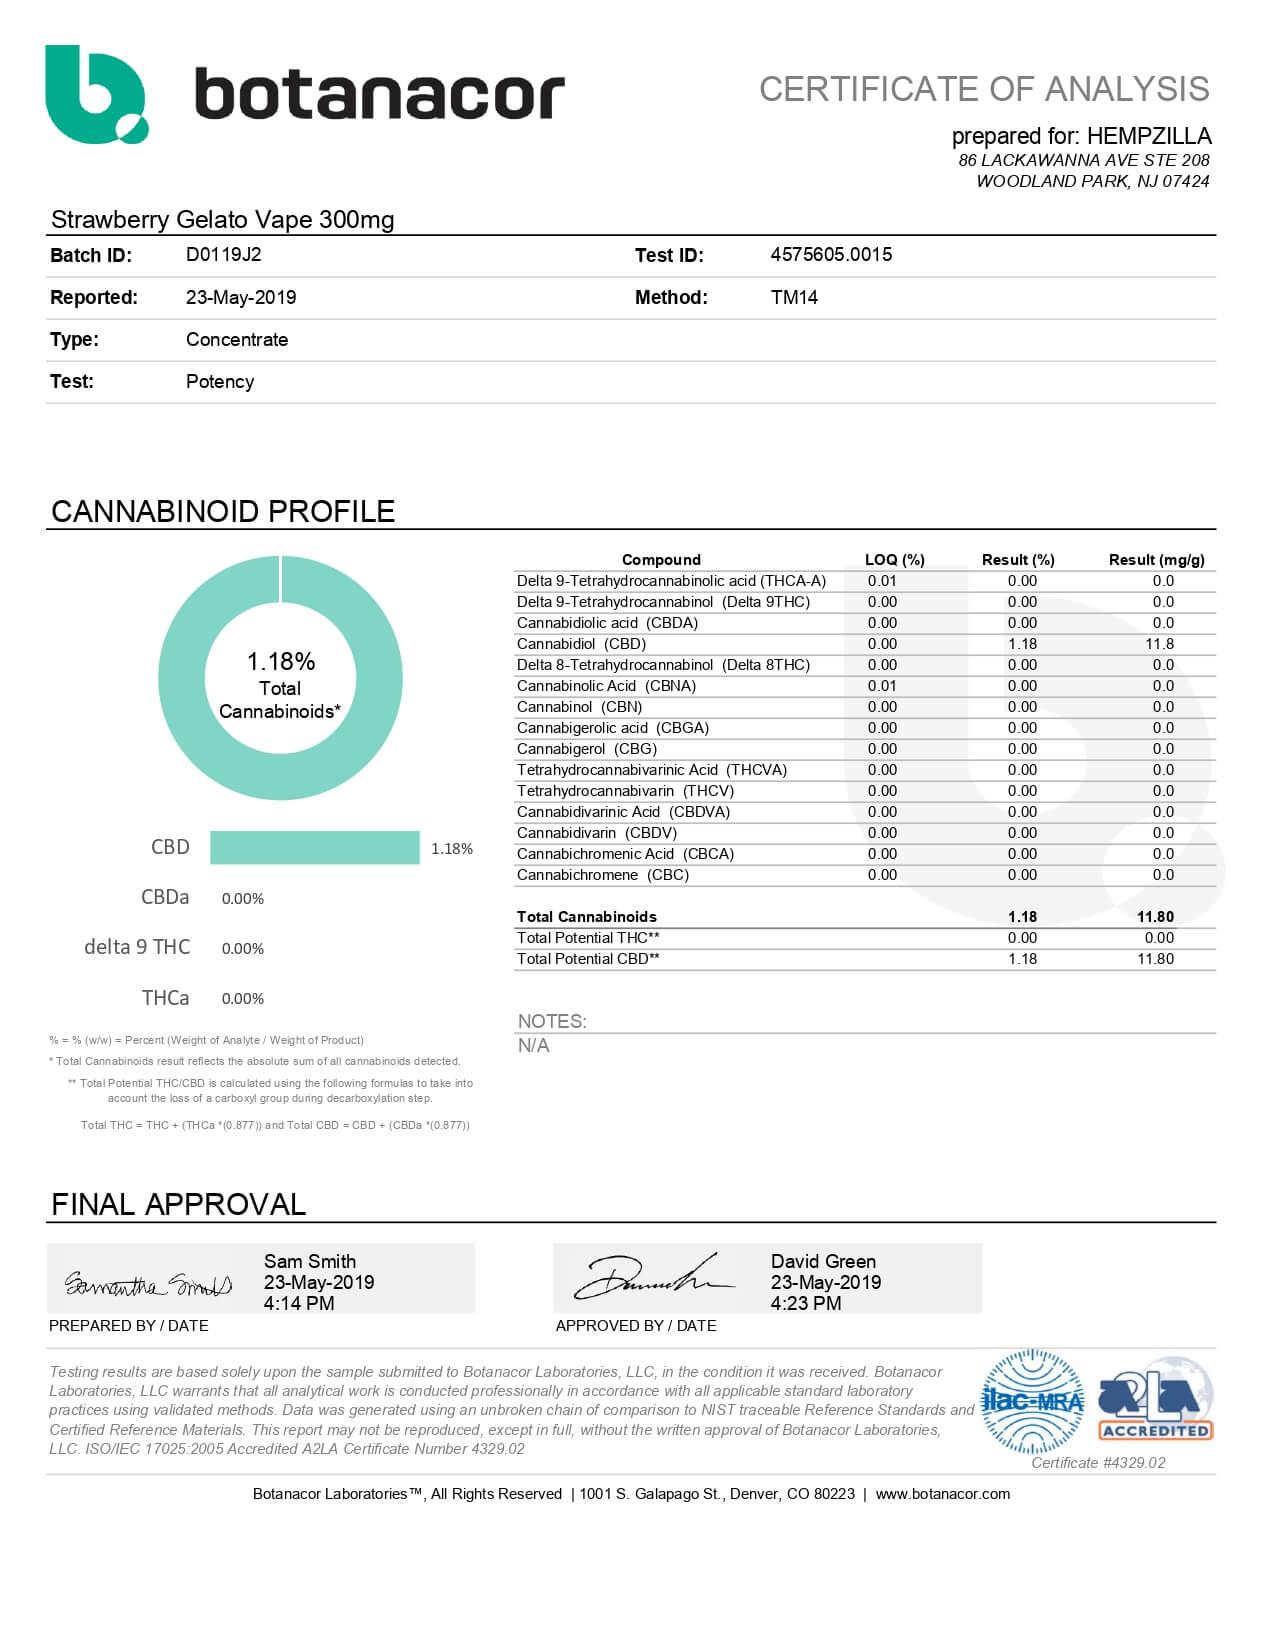 Hempzilla CBD Pod Strawberry Creme Zilla Pods Lab Report